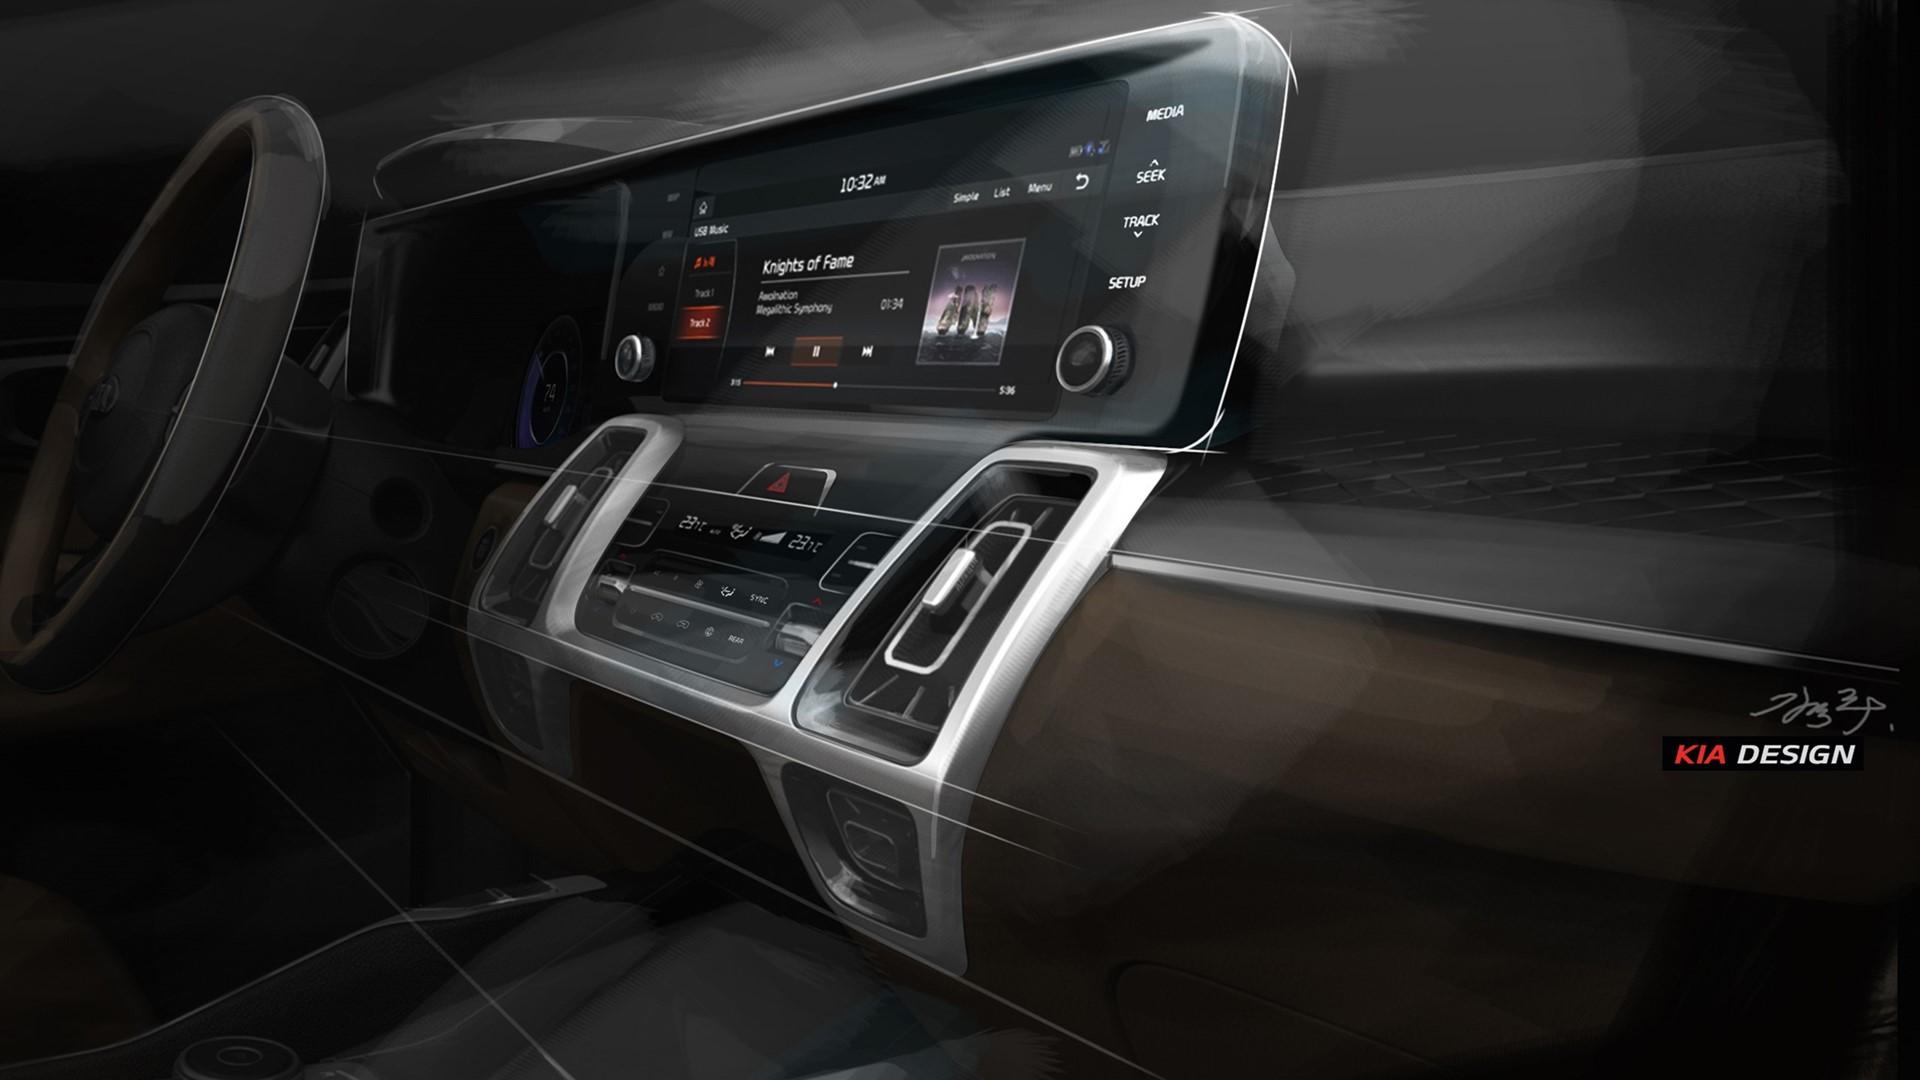 Powerful, progressive and versatile: the new Kia Sorento - Image 1